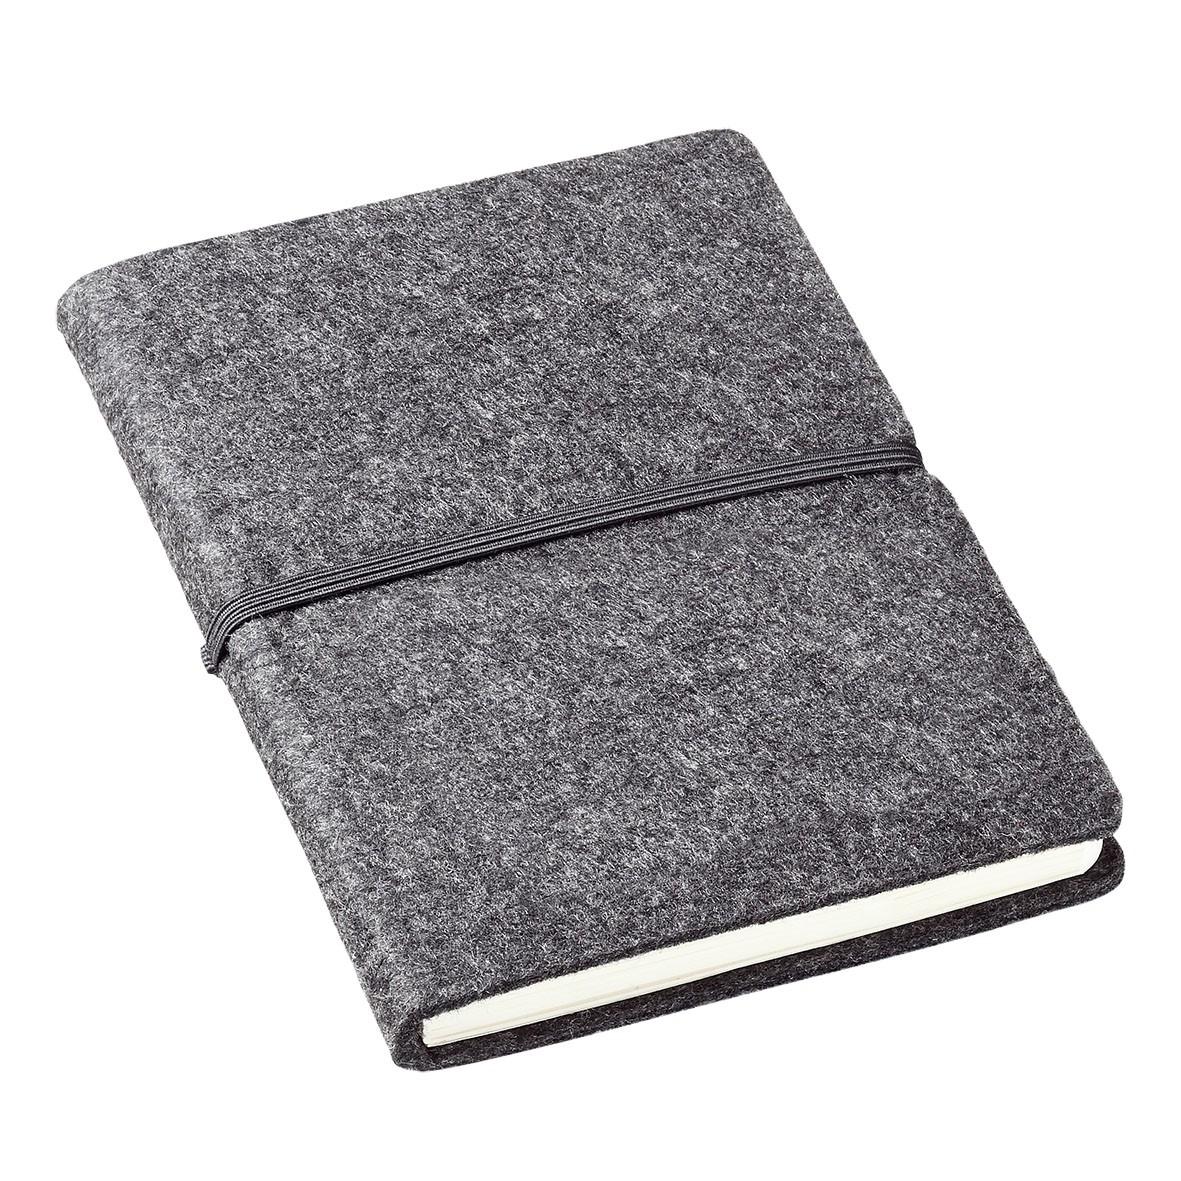 Notizbuch Filz, grau